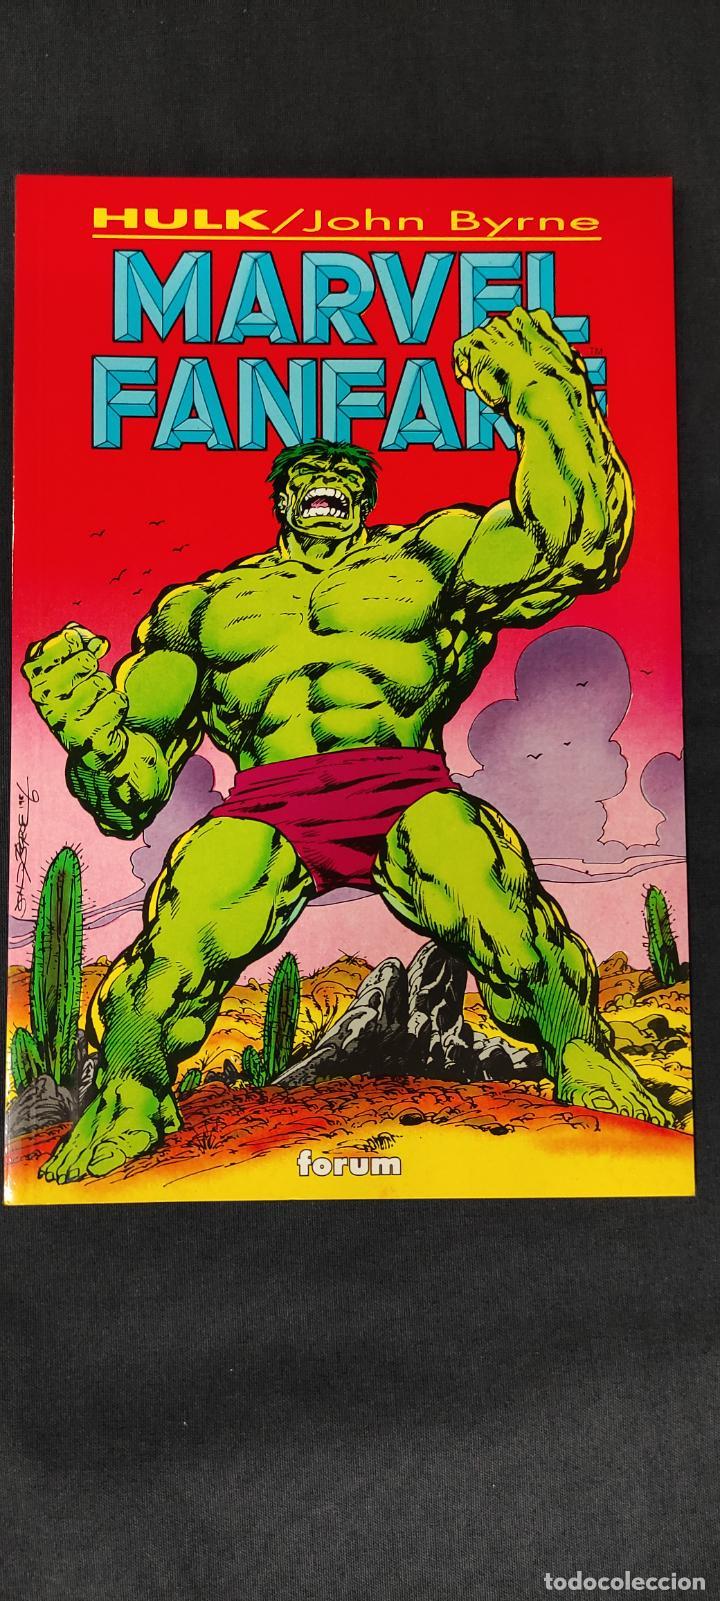 HULK - MARVEL FANFARE - FORUM - (Tebeos y Comics - Forum - Hulk)